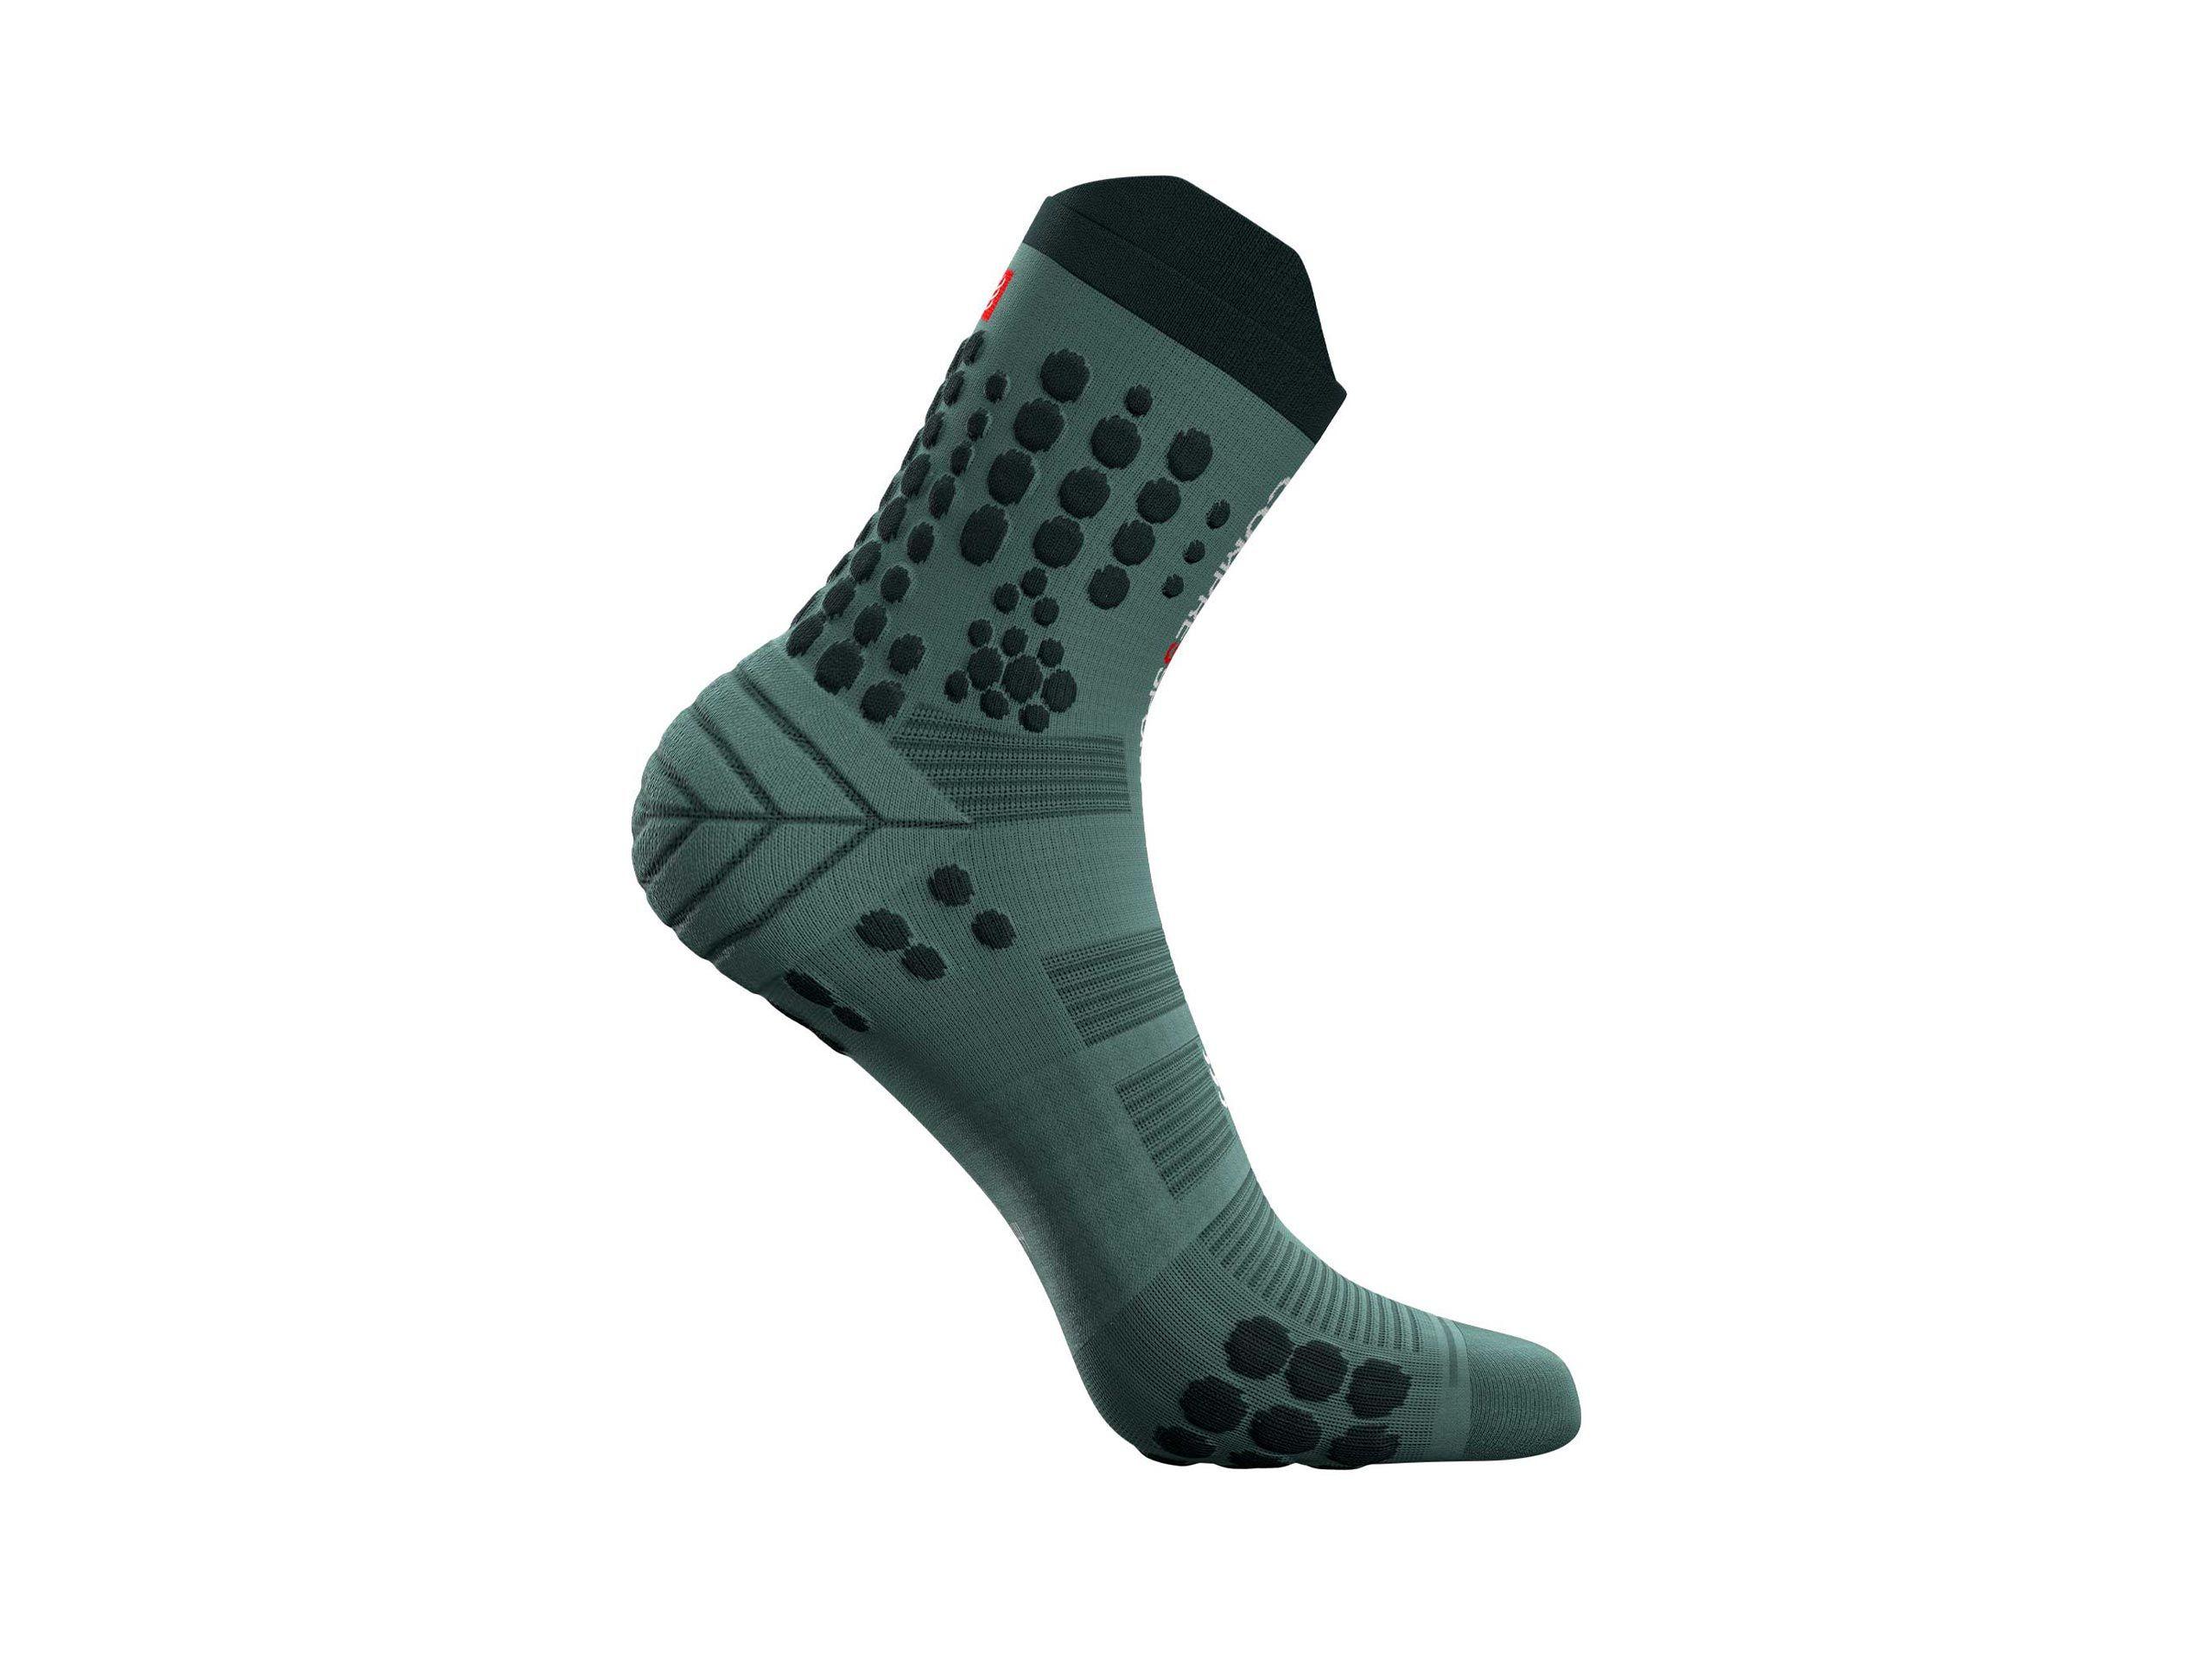 Pro Racing Socks v3.0 Trail - Silver Pine